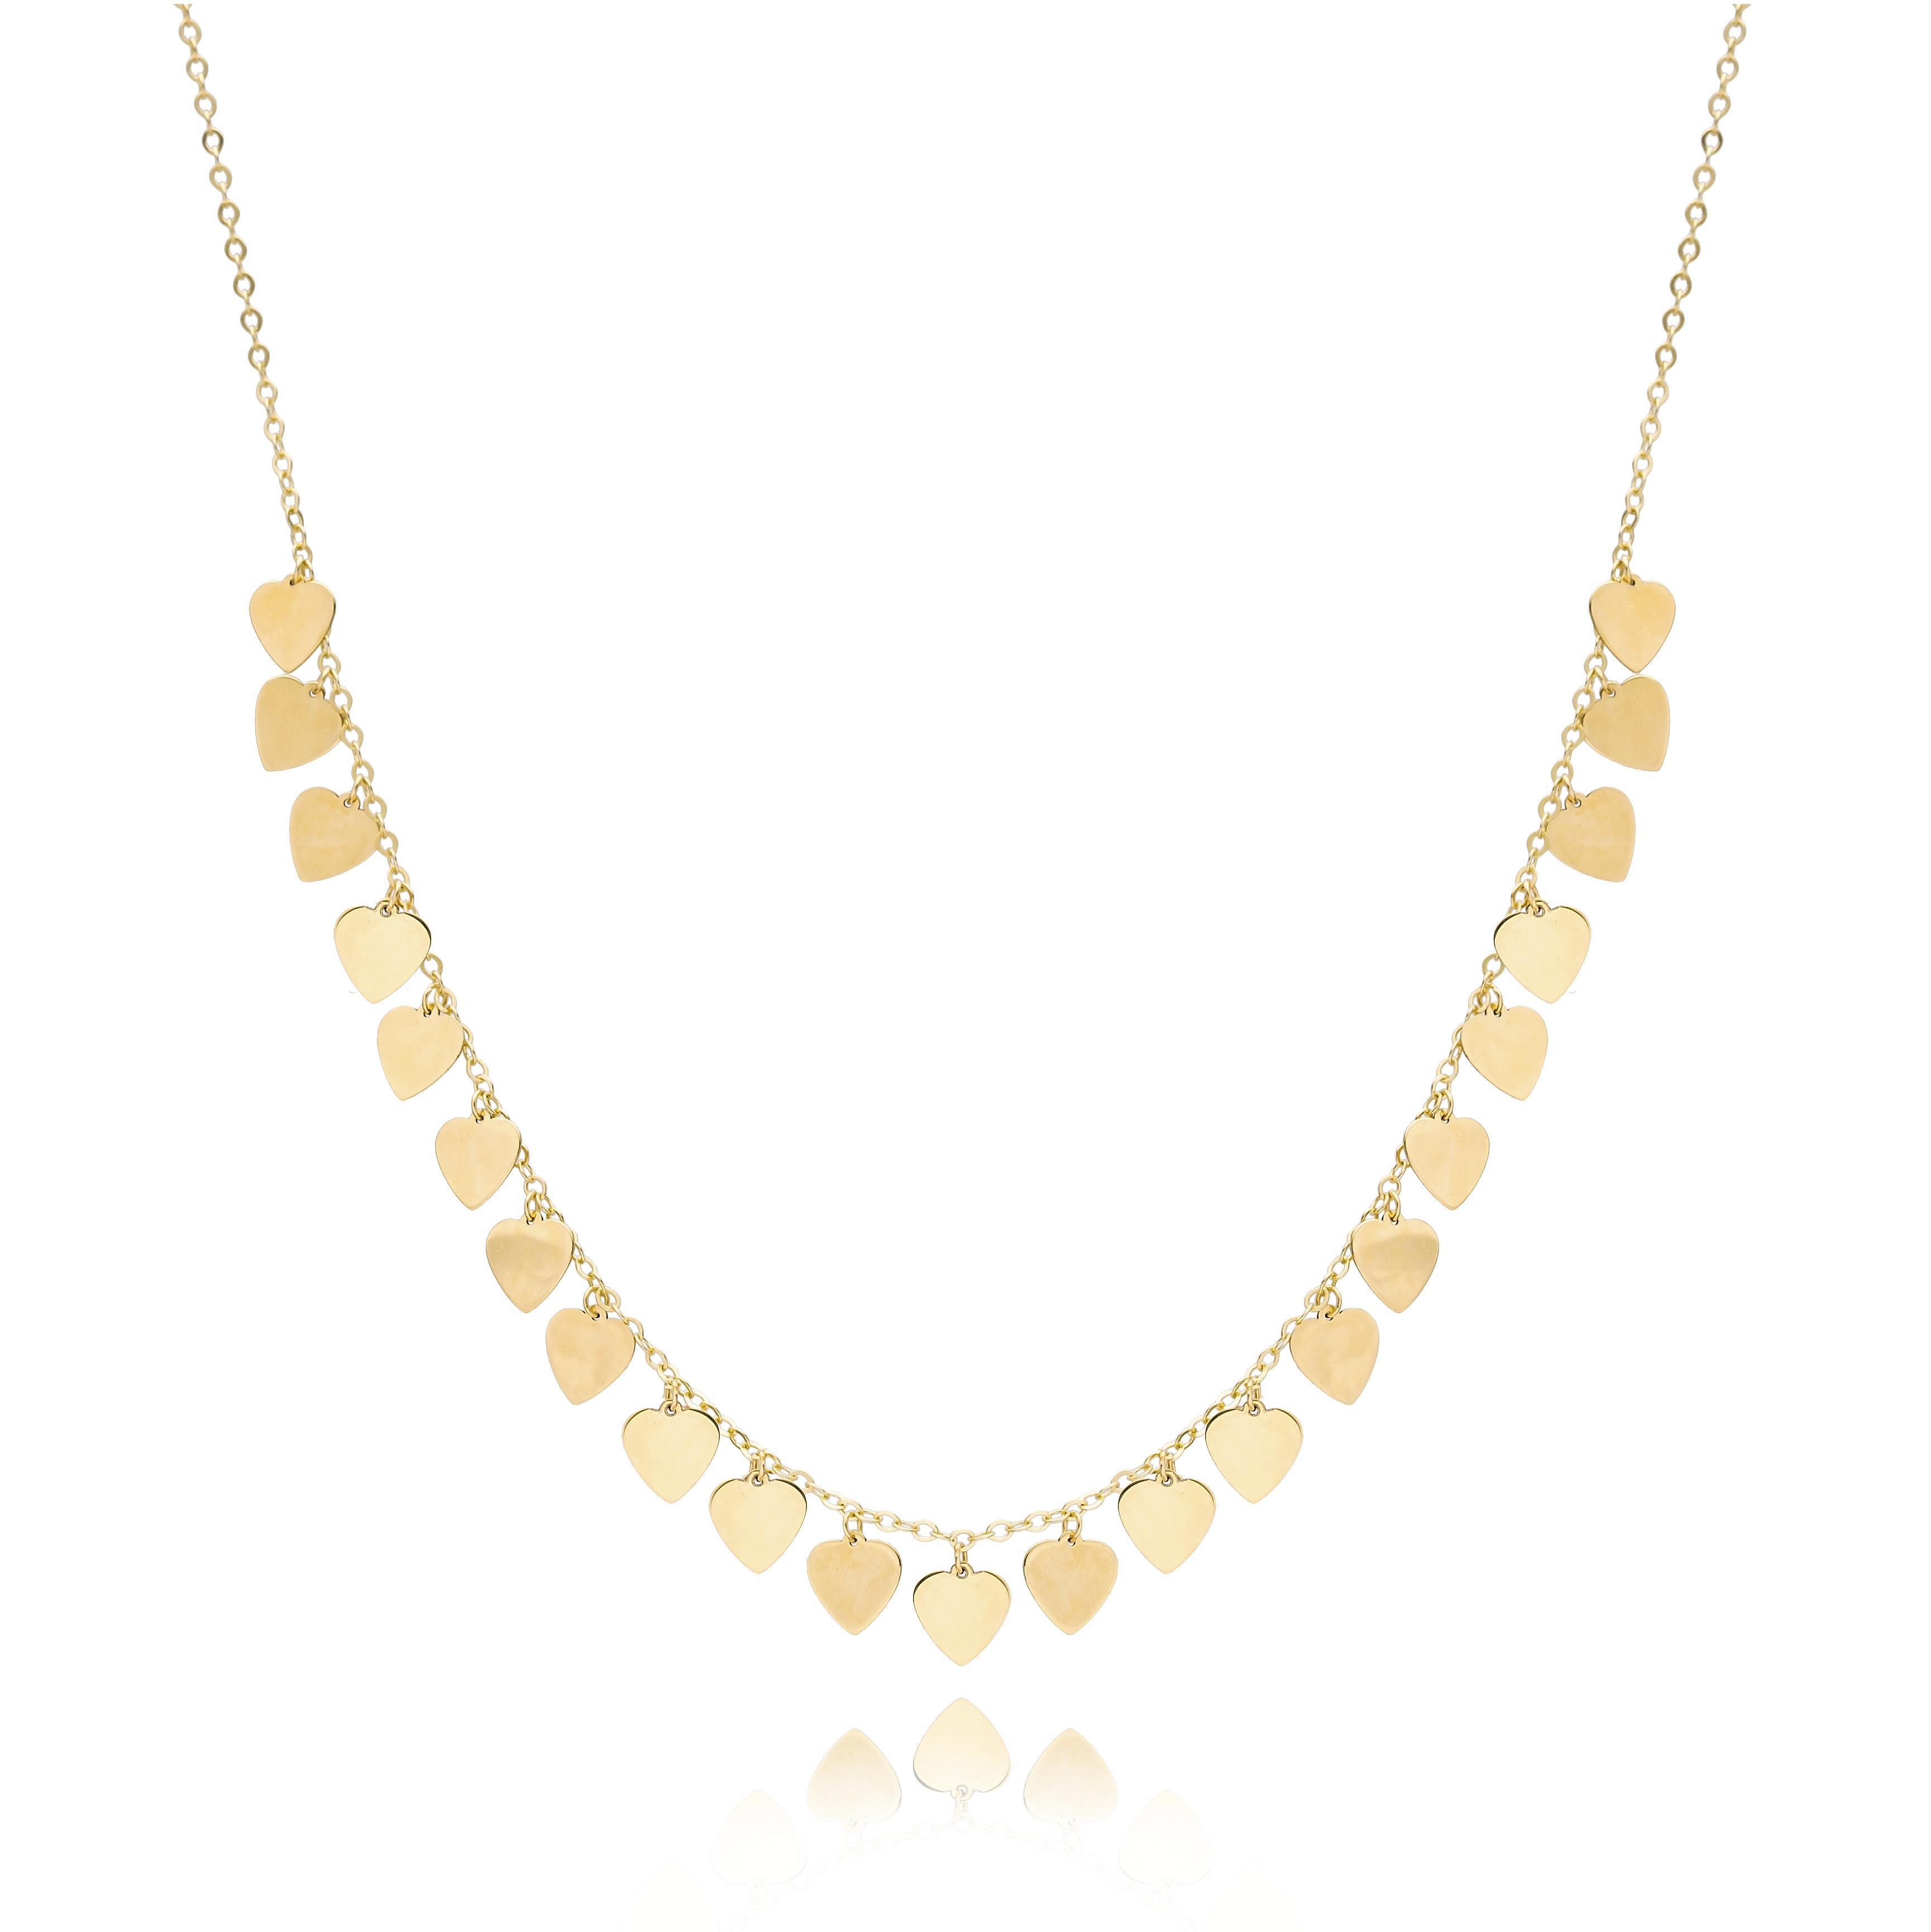 10K Gold Elegant Shaker Heart Pendant Wholesale Handmade Turkish Jewelry